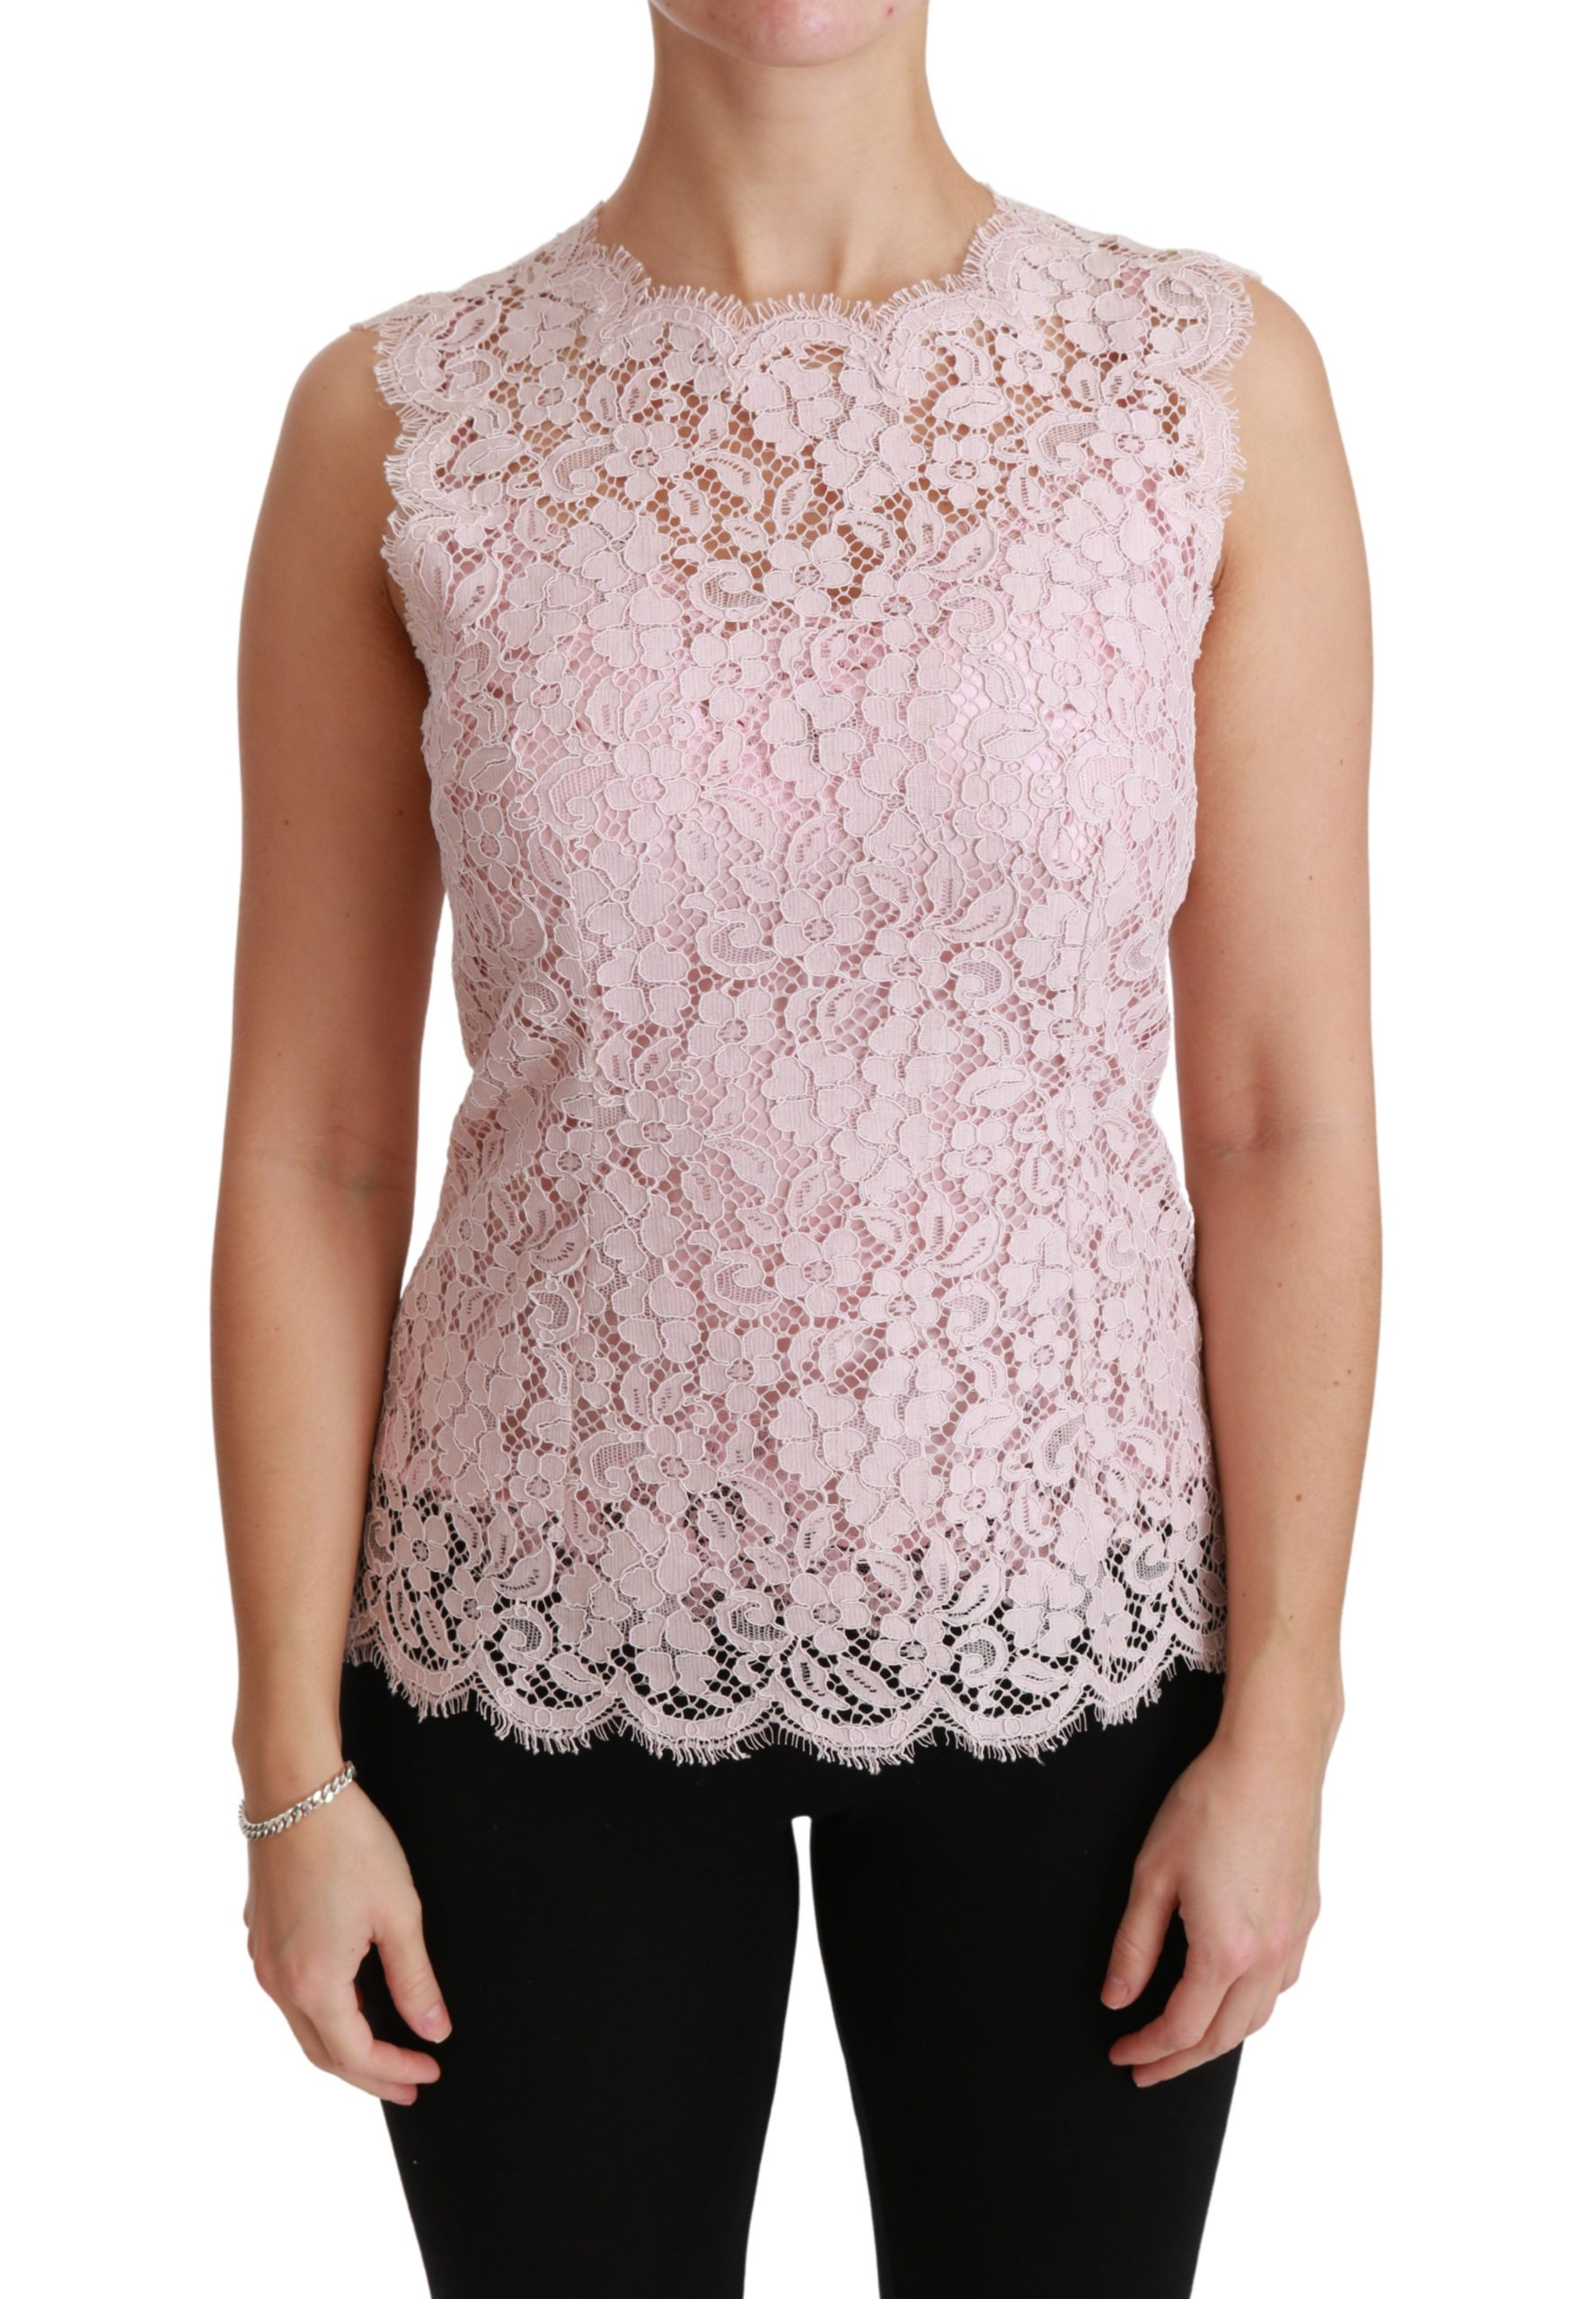 Dolce & Gabbana Women's Lace Sleeveless Cotton Top Pink TSH4398 - IT40 S